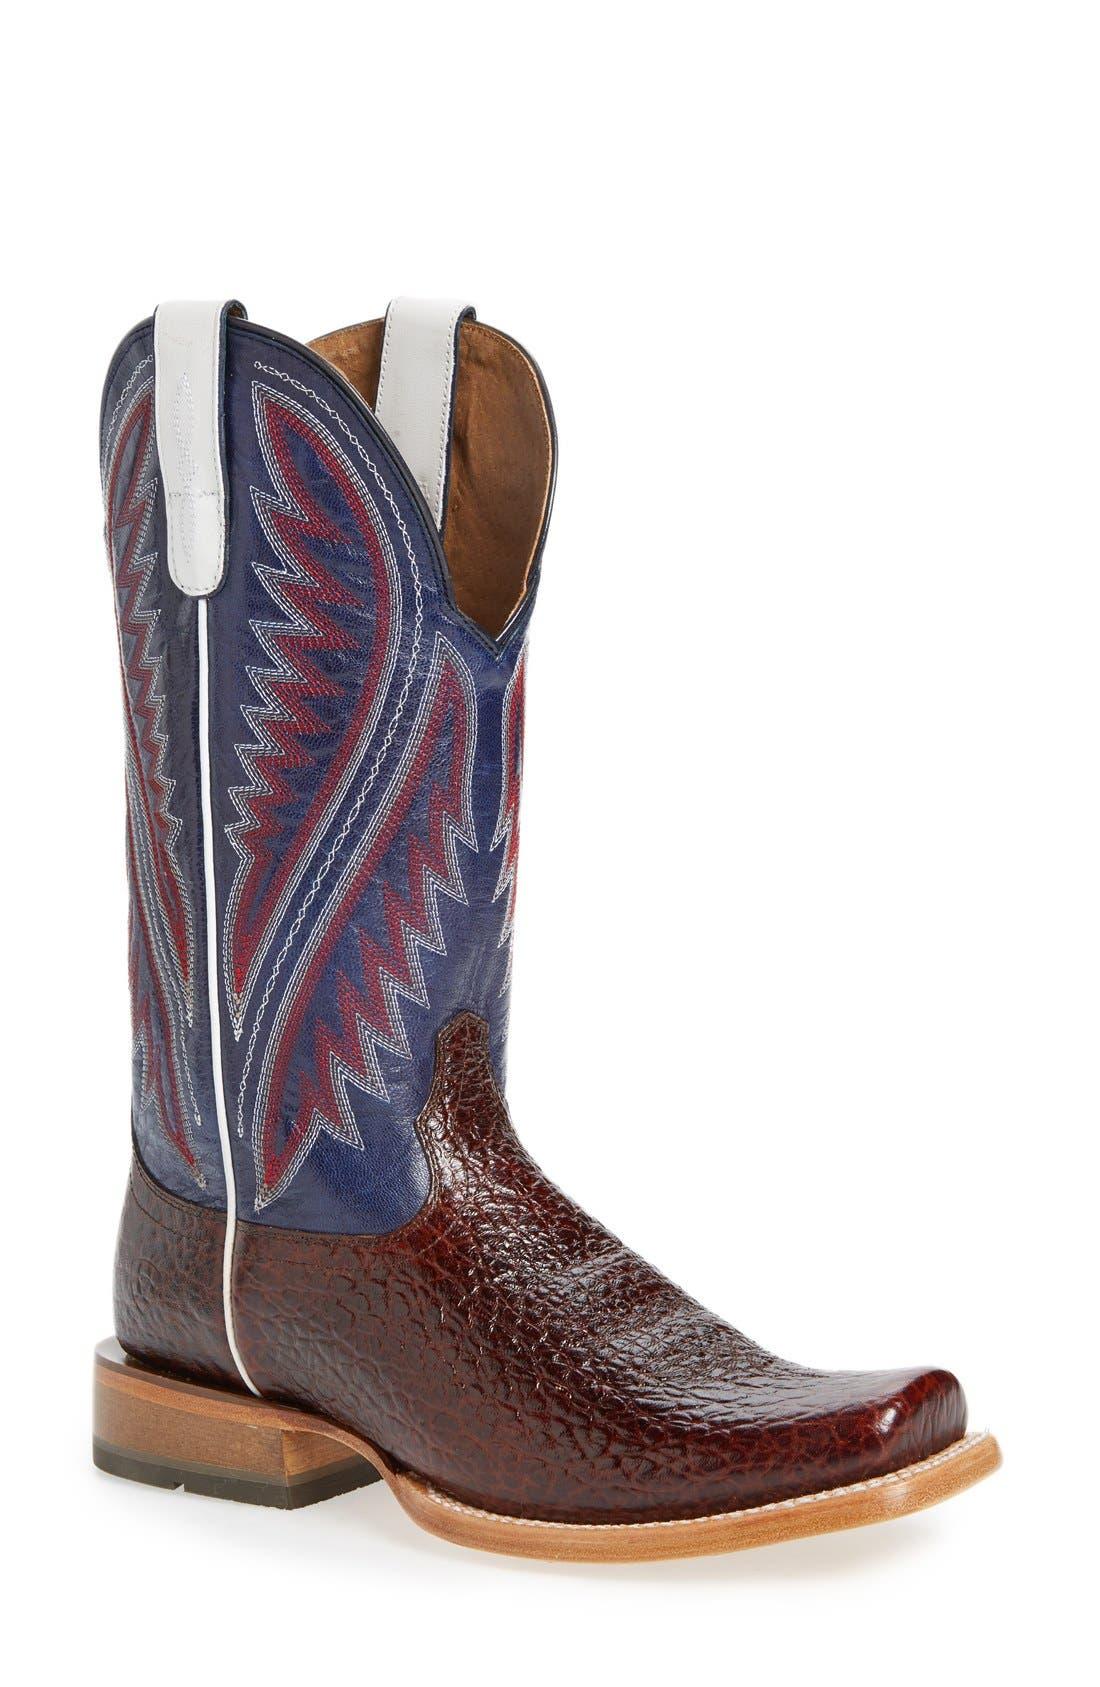 Main Image - Ariat 'Hoolihan' Cowboy Boot (Men)